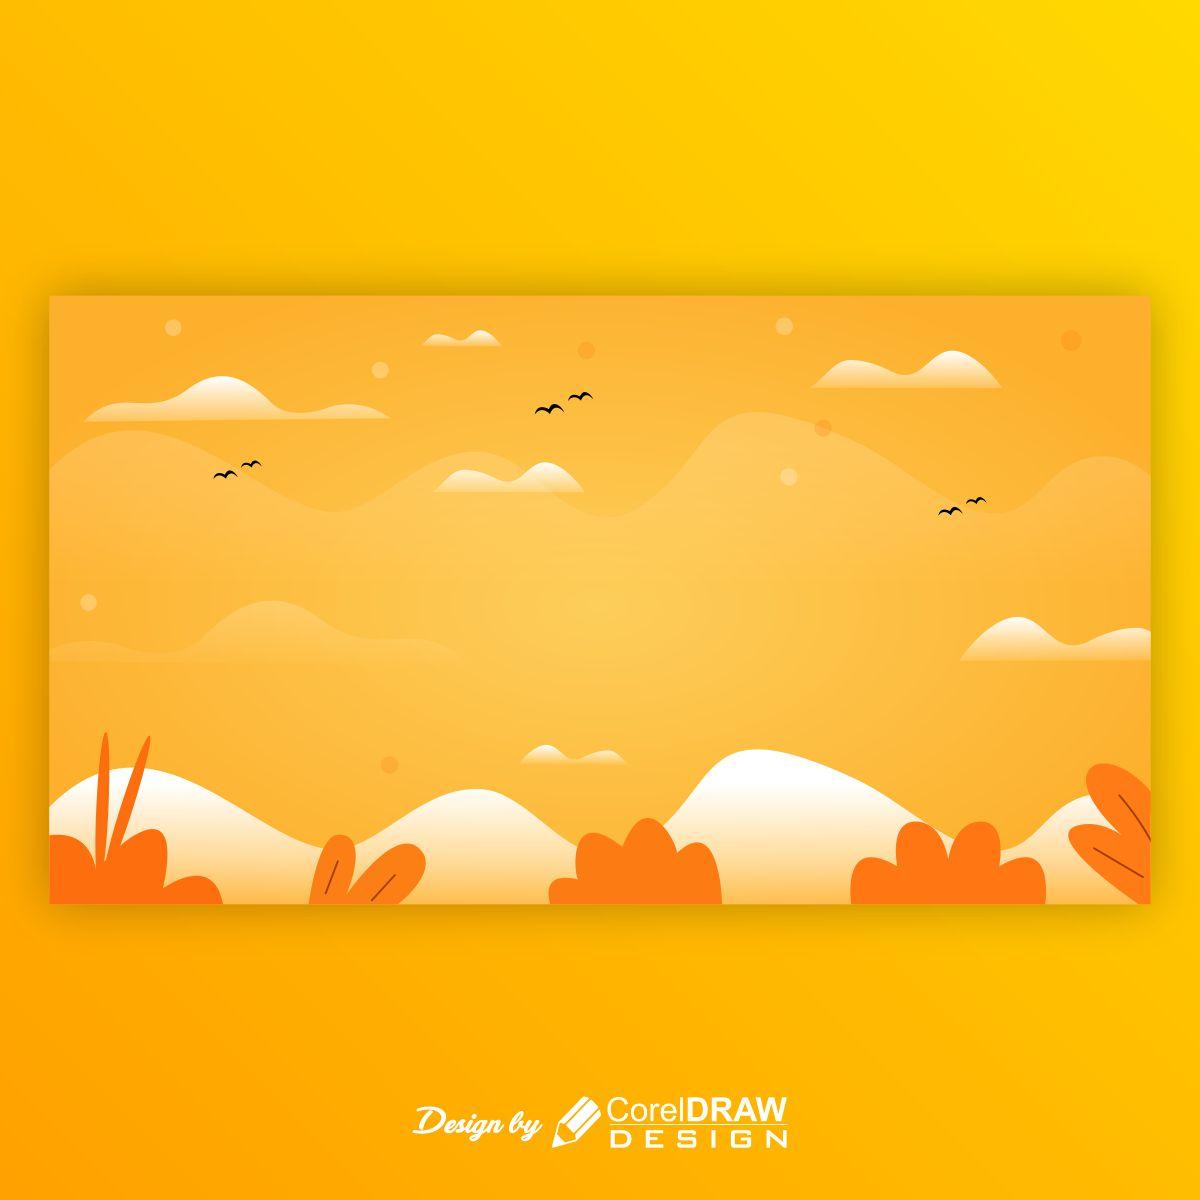 Download Web Banner Template Background | CorelDraw Design (Download Free  CDR, Vector, Stock Images, Tutorials, Tips & Tricks)